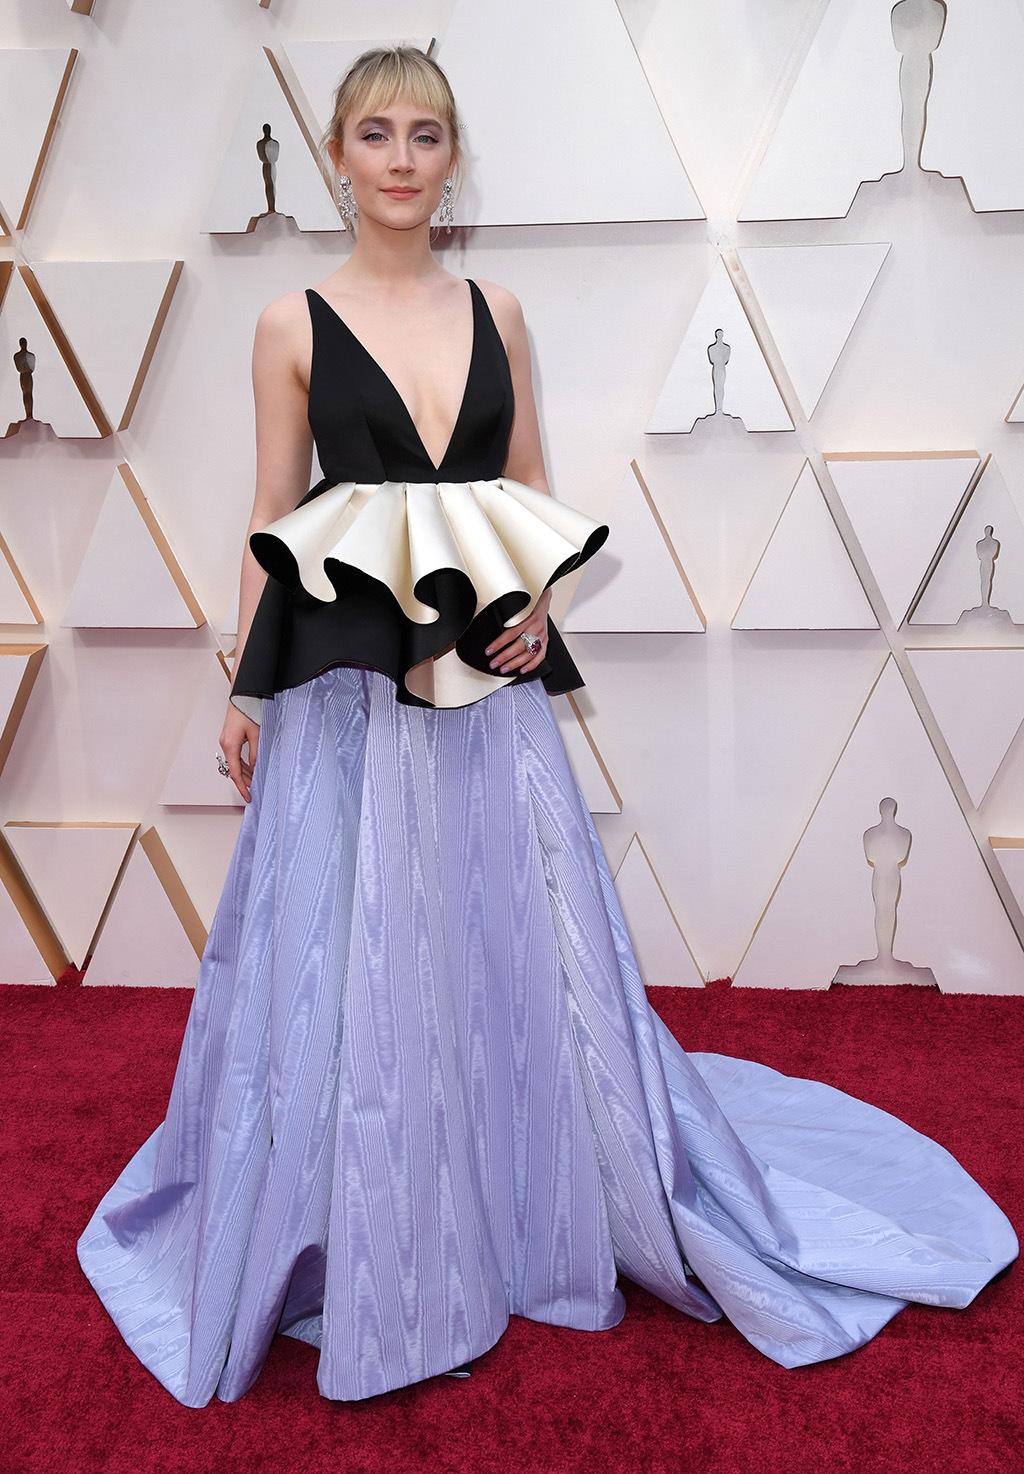 thảm đỏ oscar 2020 Saoirse Ronan đầm xanh đen gucci